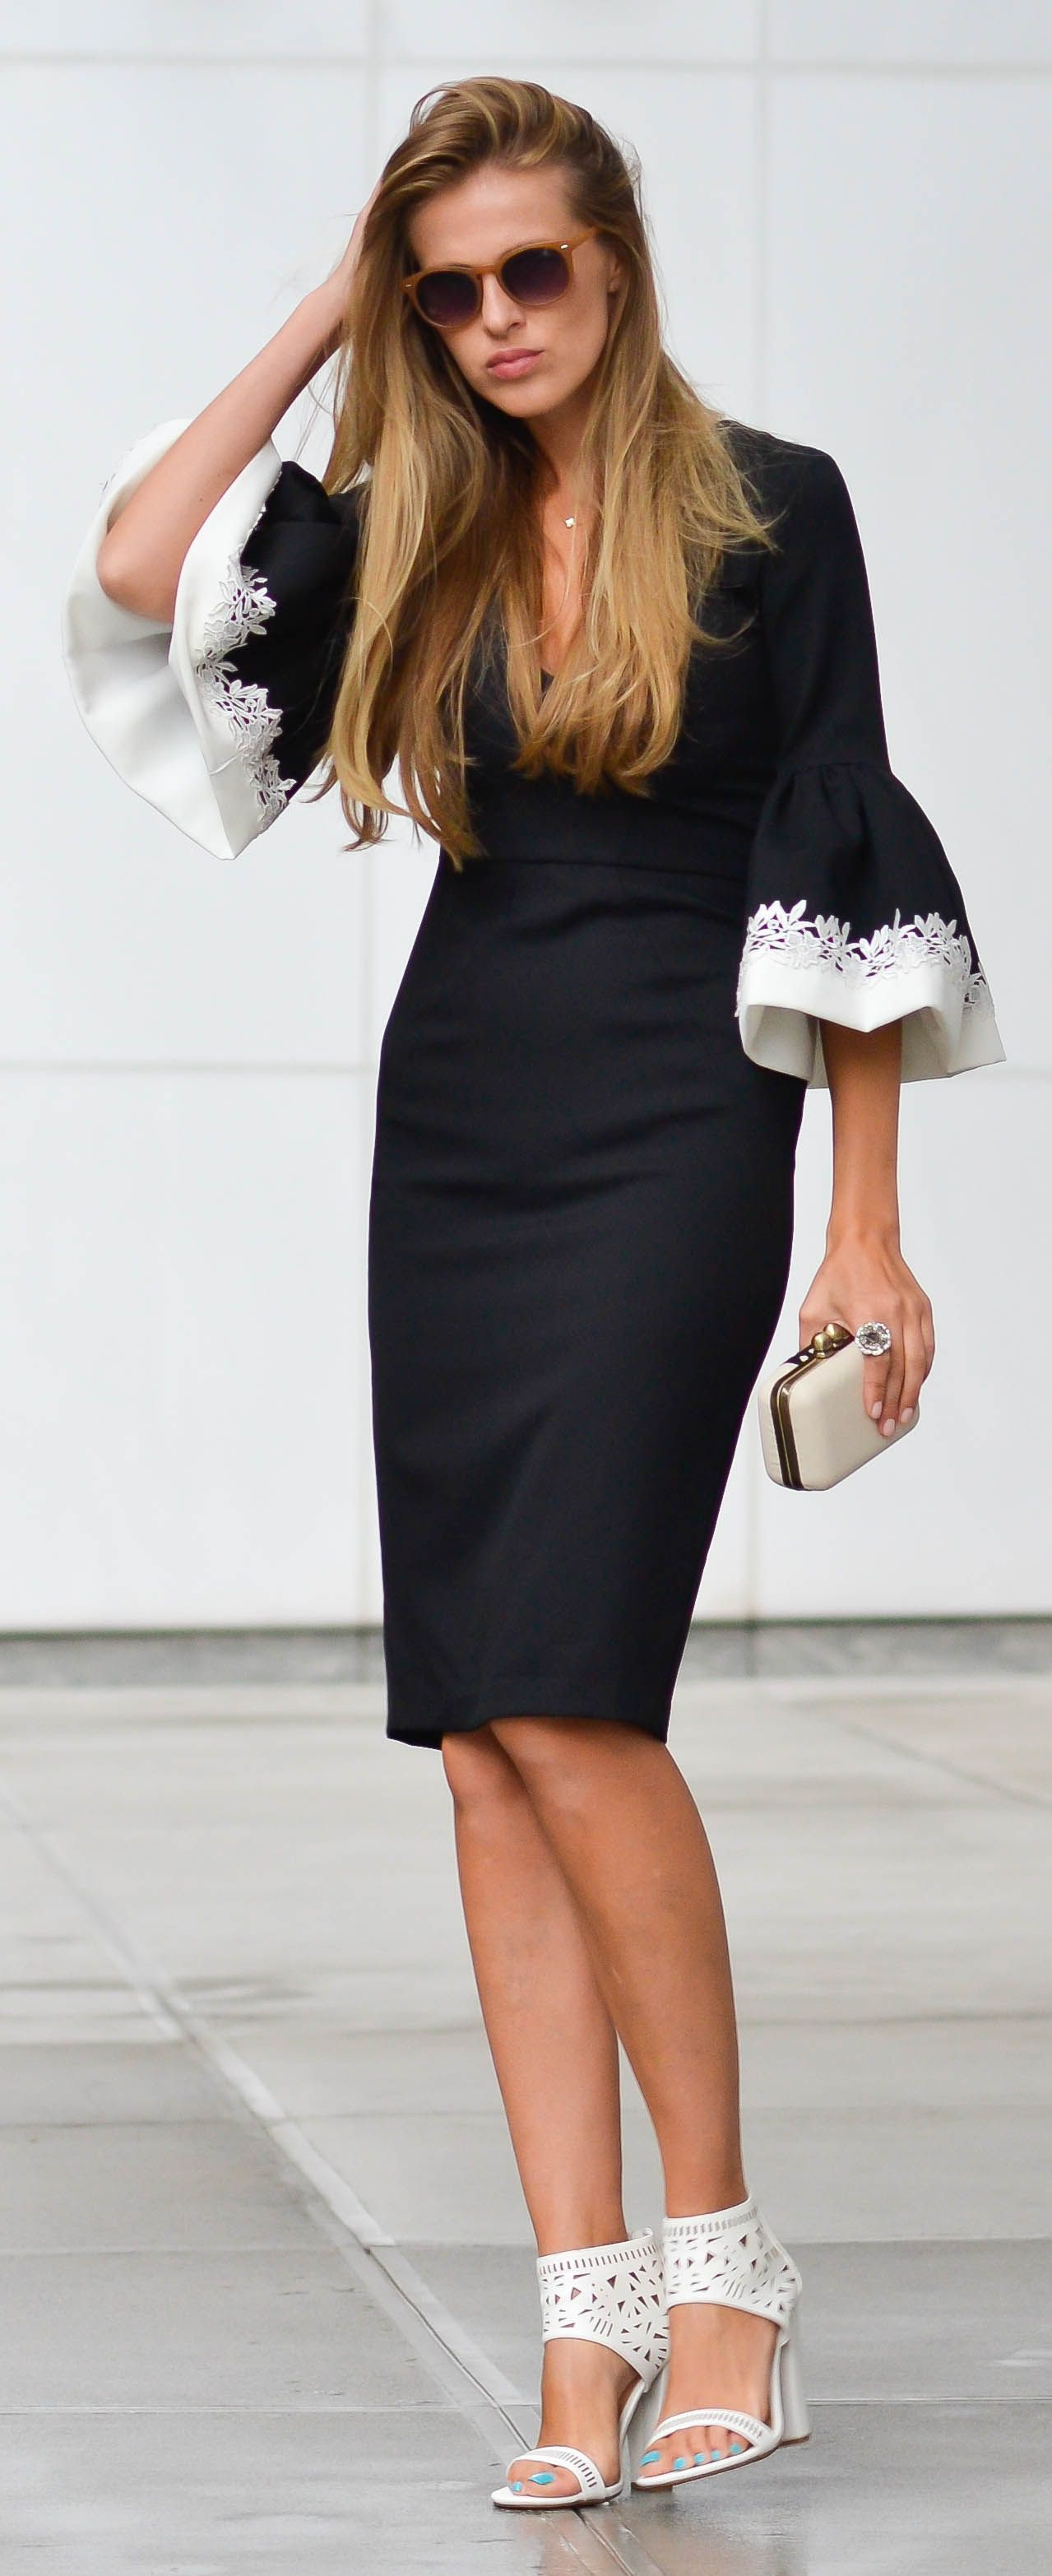 Black And White Glamorous Dress